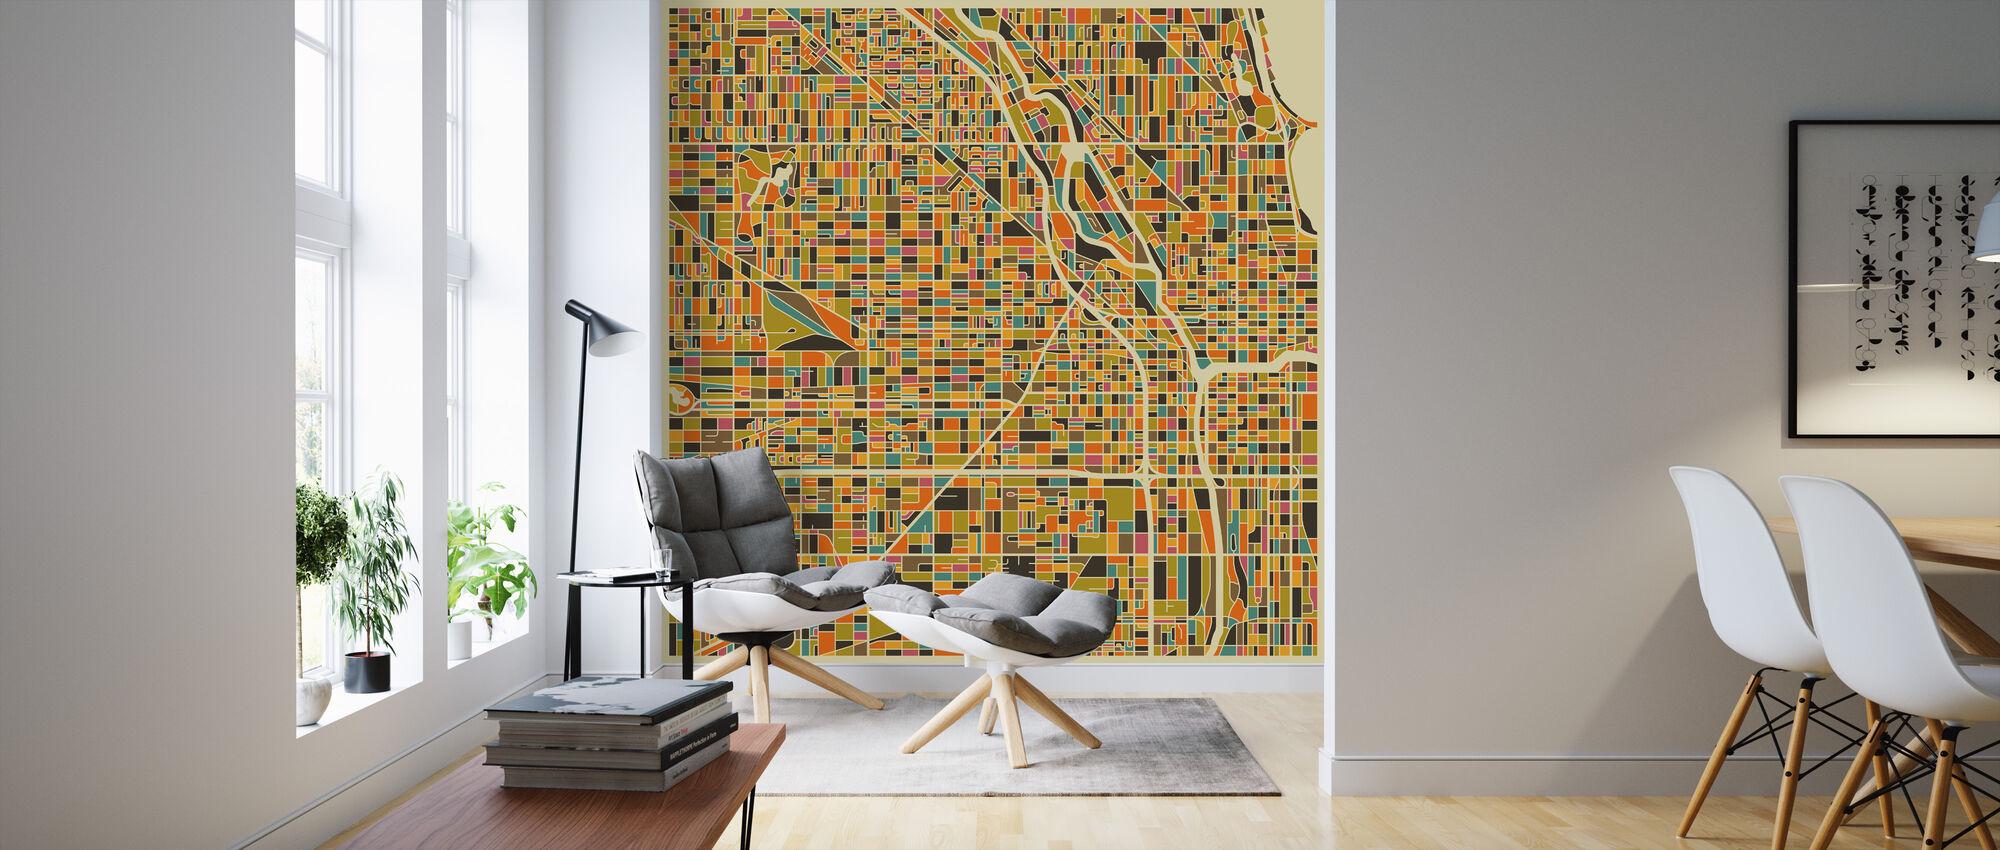 Multicolor Map - Chicago - Wallpaper - Living Room